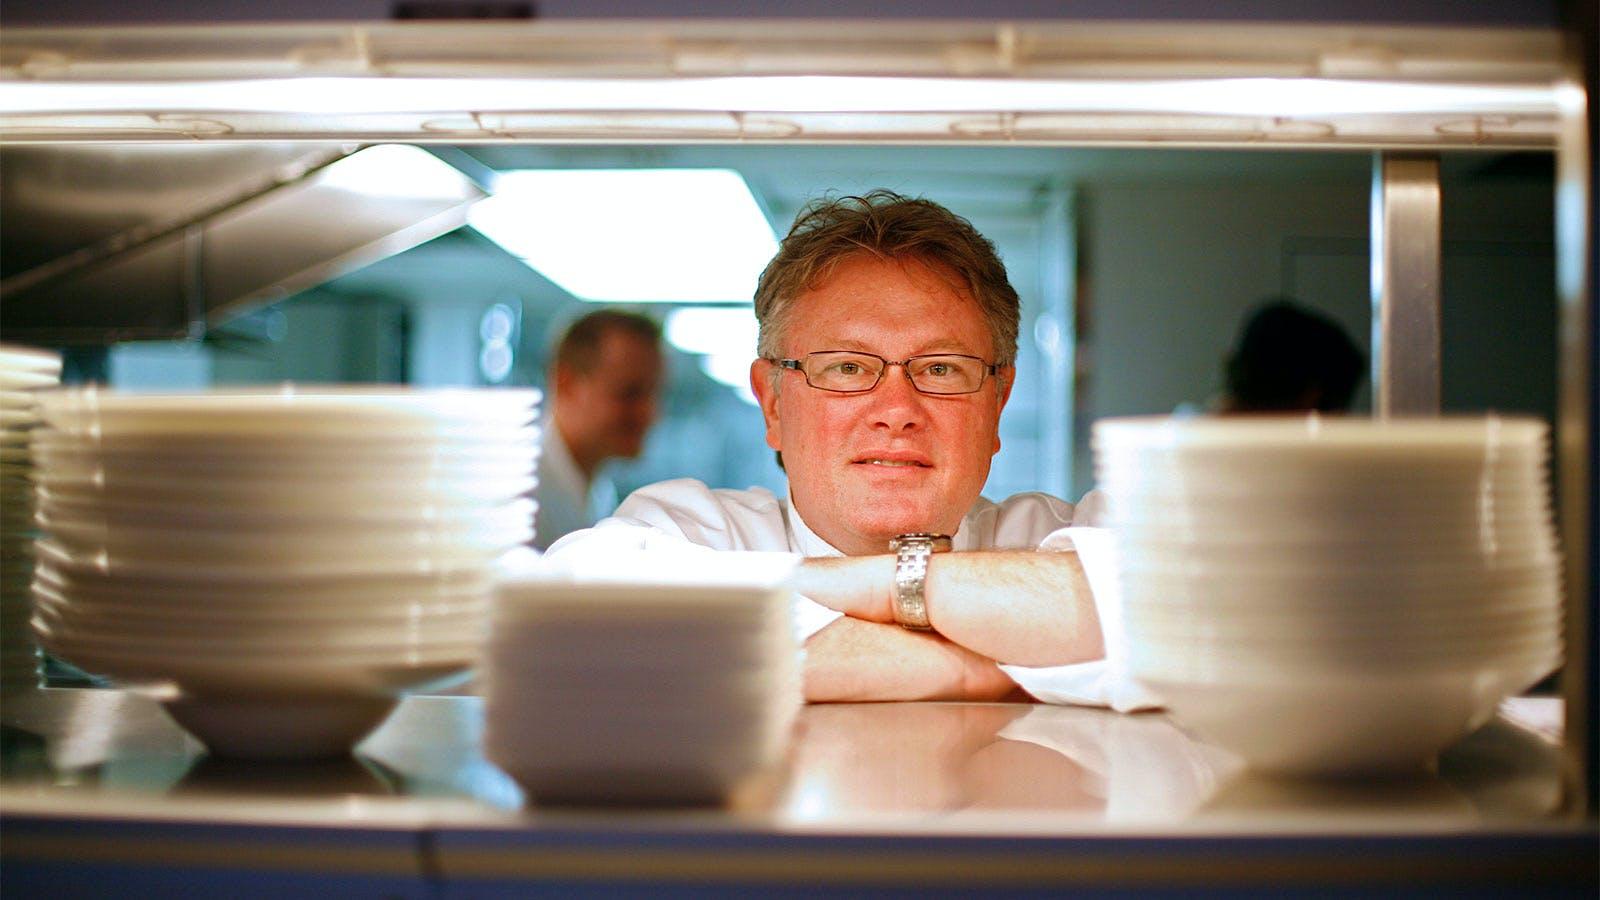 Pioneering Chef and Restaurateur Gray Kunz Dies at 65